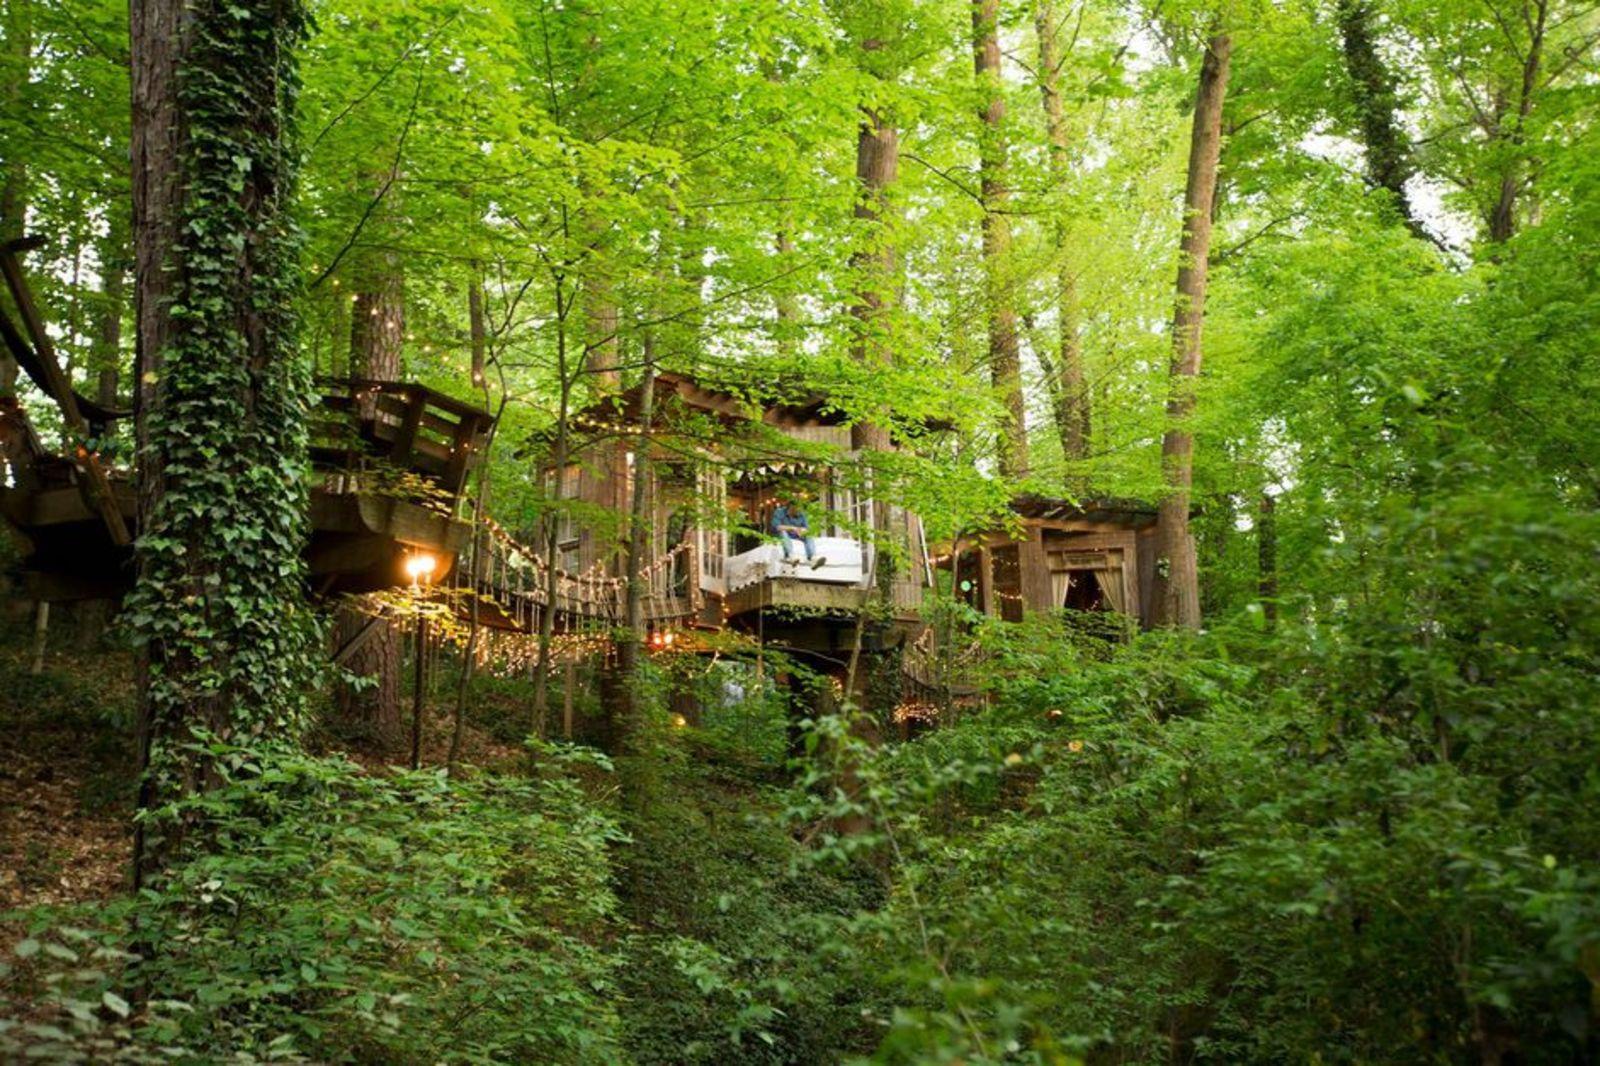 Cabaña en Atlanta, Secluded Intown Treehouse